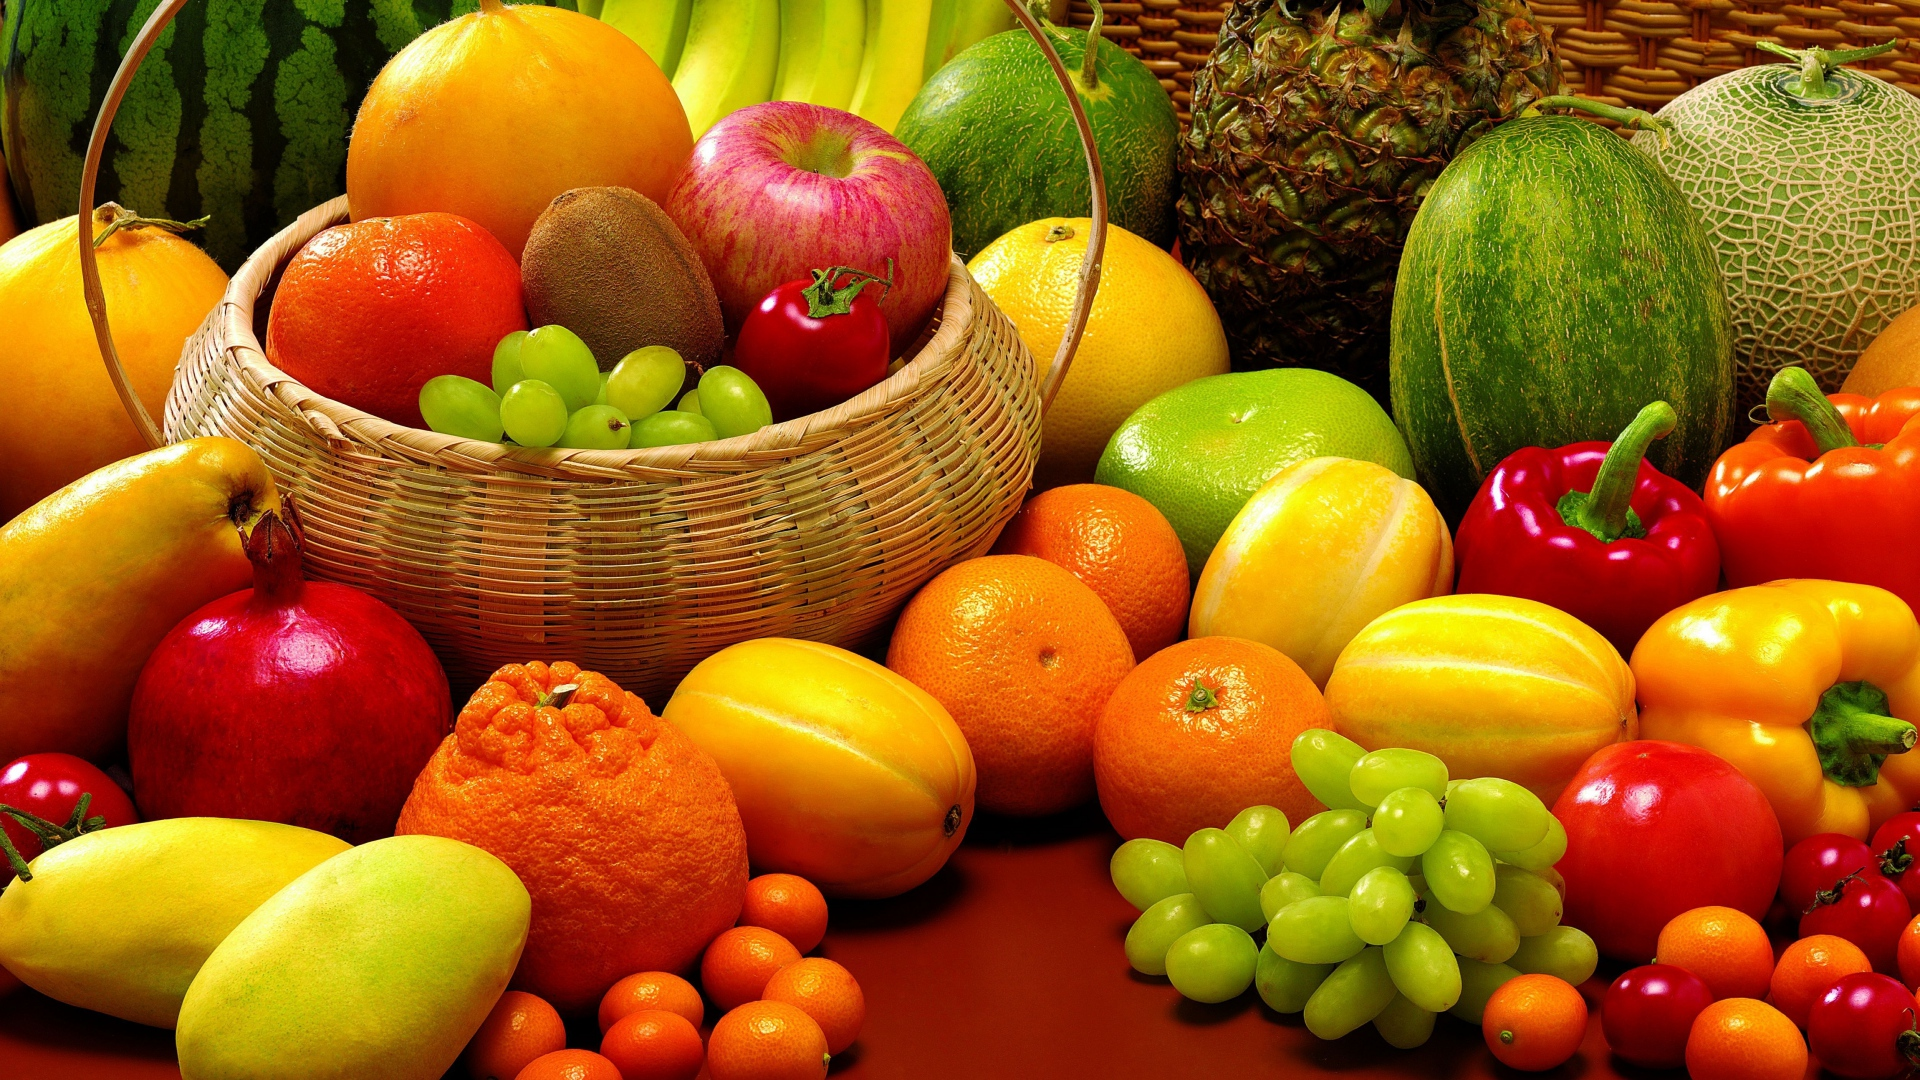 Download Wallpaper 1920x1080 Fruit Allsorts Pineapple Melon